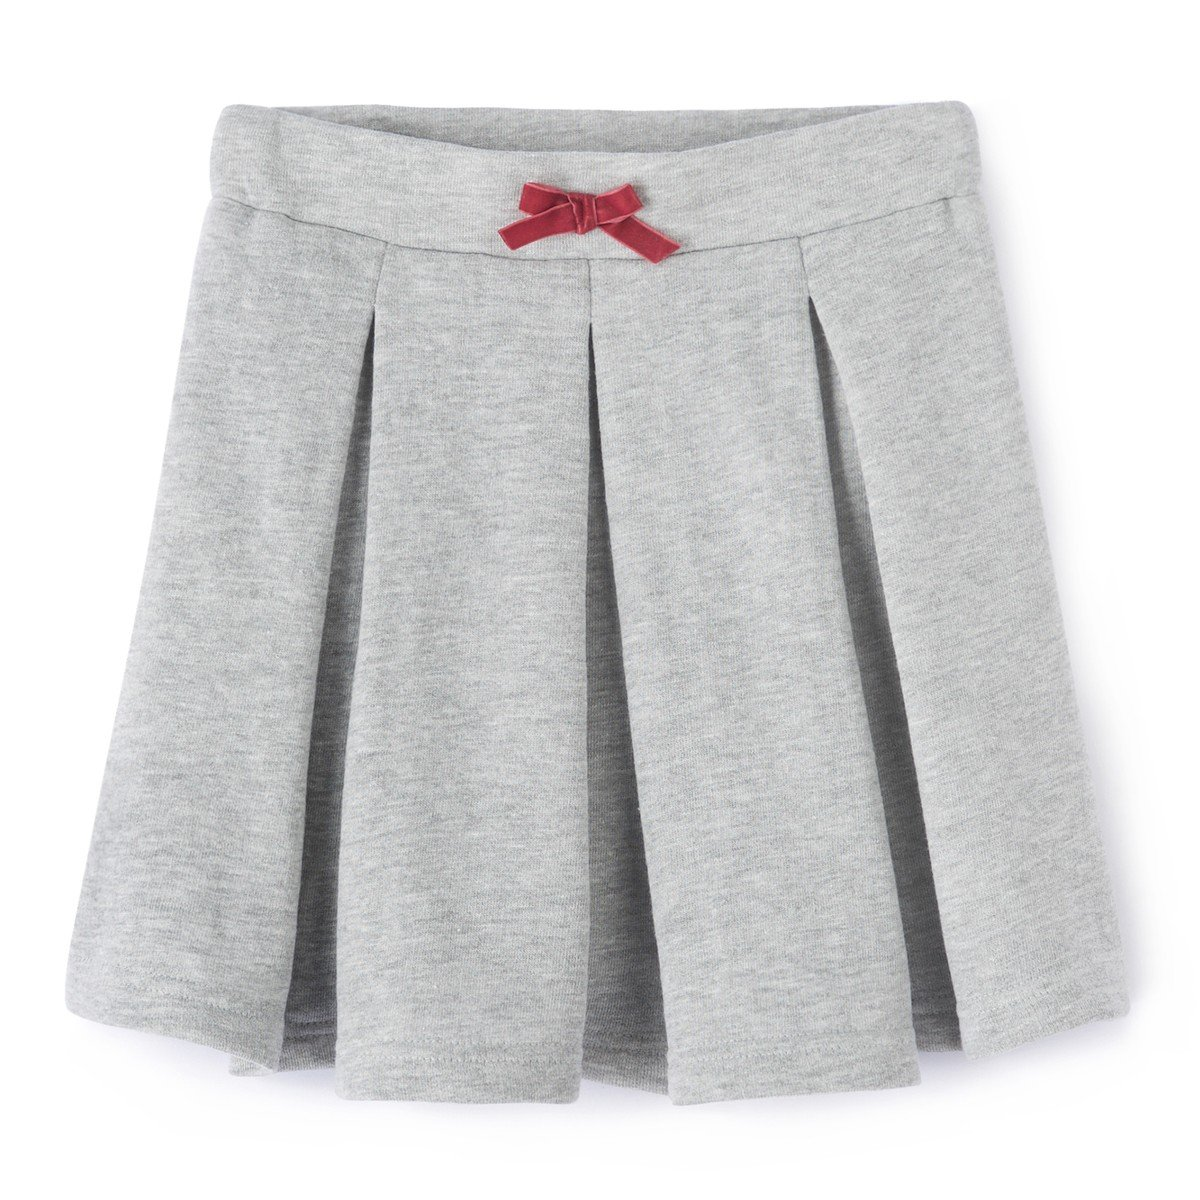 3-12 Years La Redoute Collections Big Girls Fleece Skater Skirt